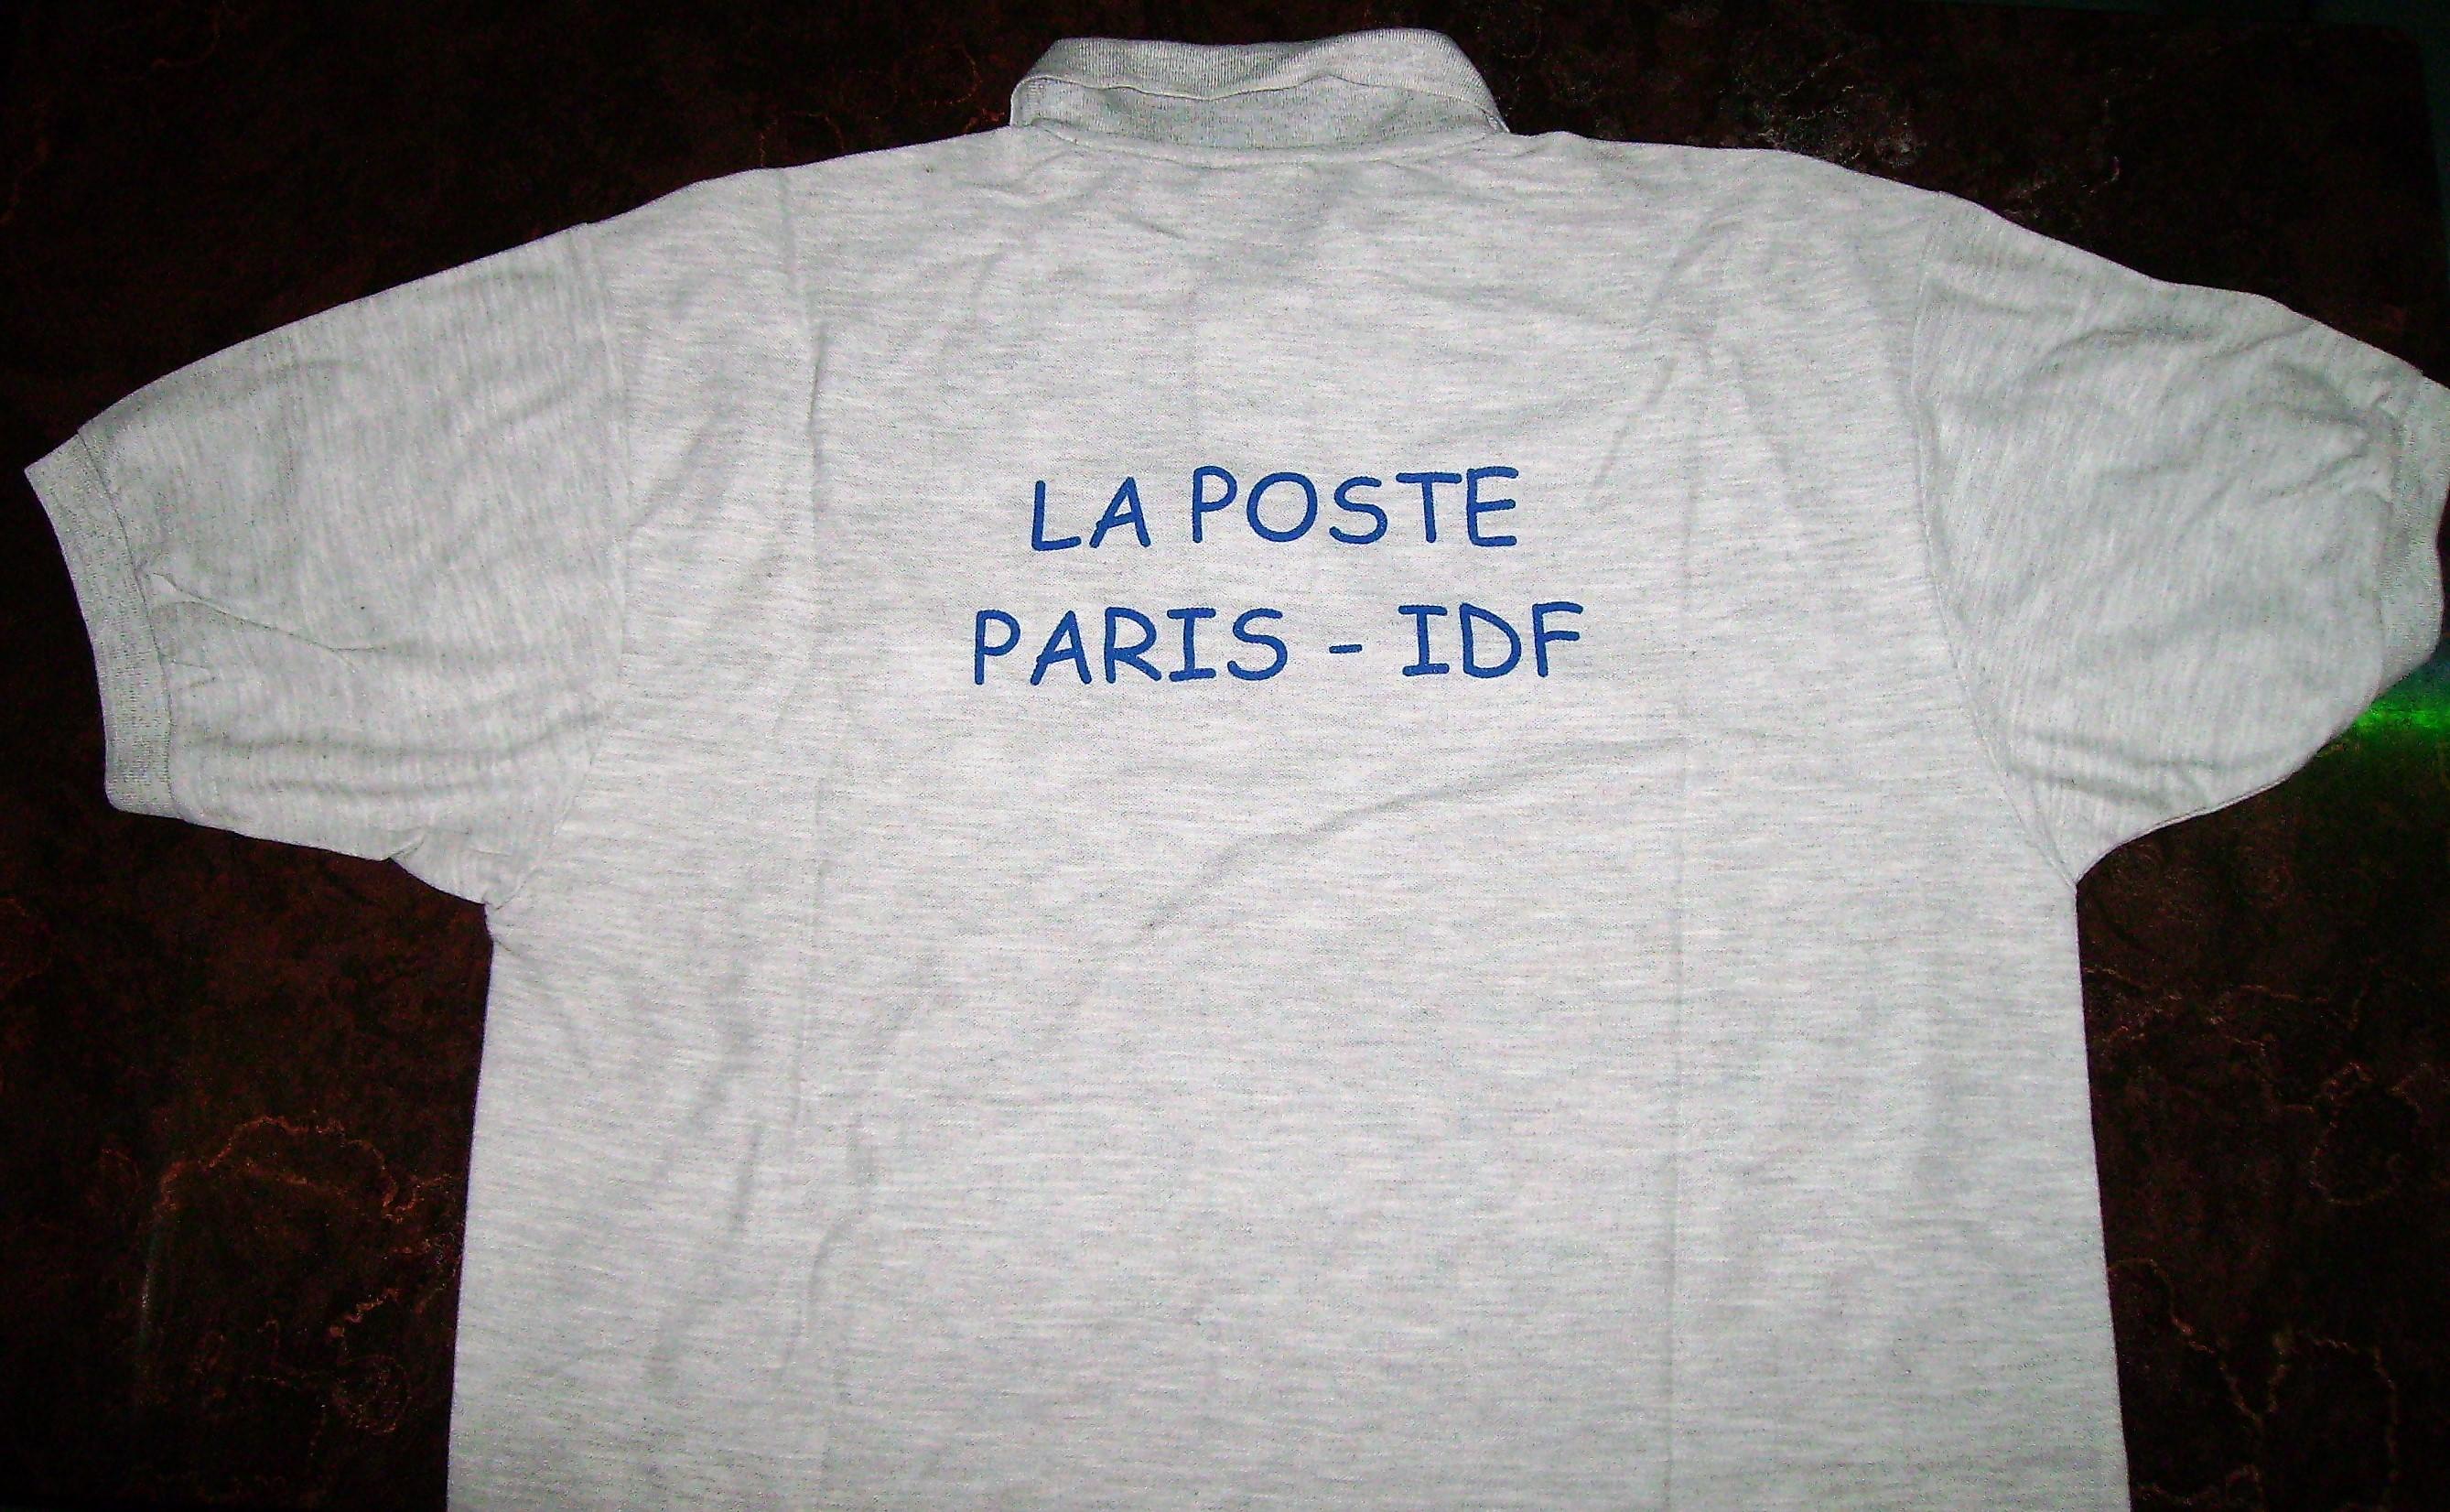 Maillot SE La Poste dos.jpg